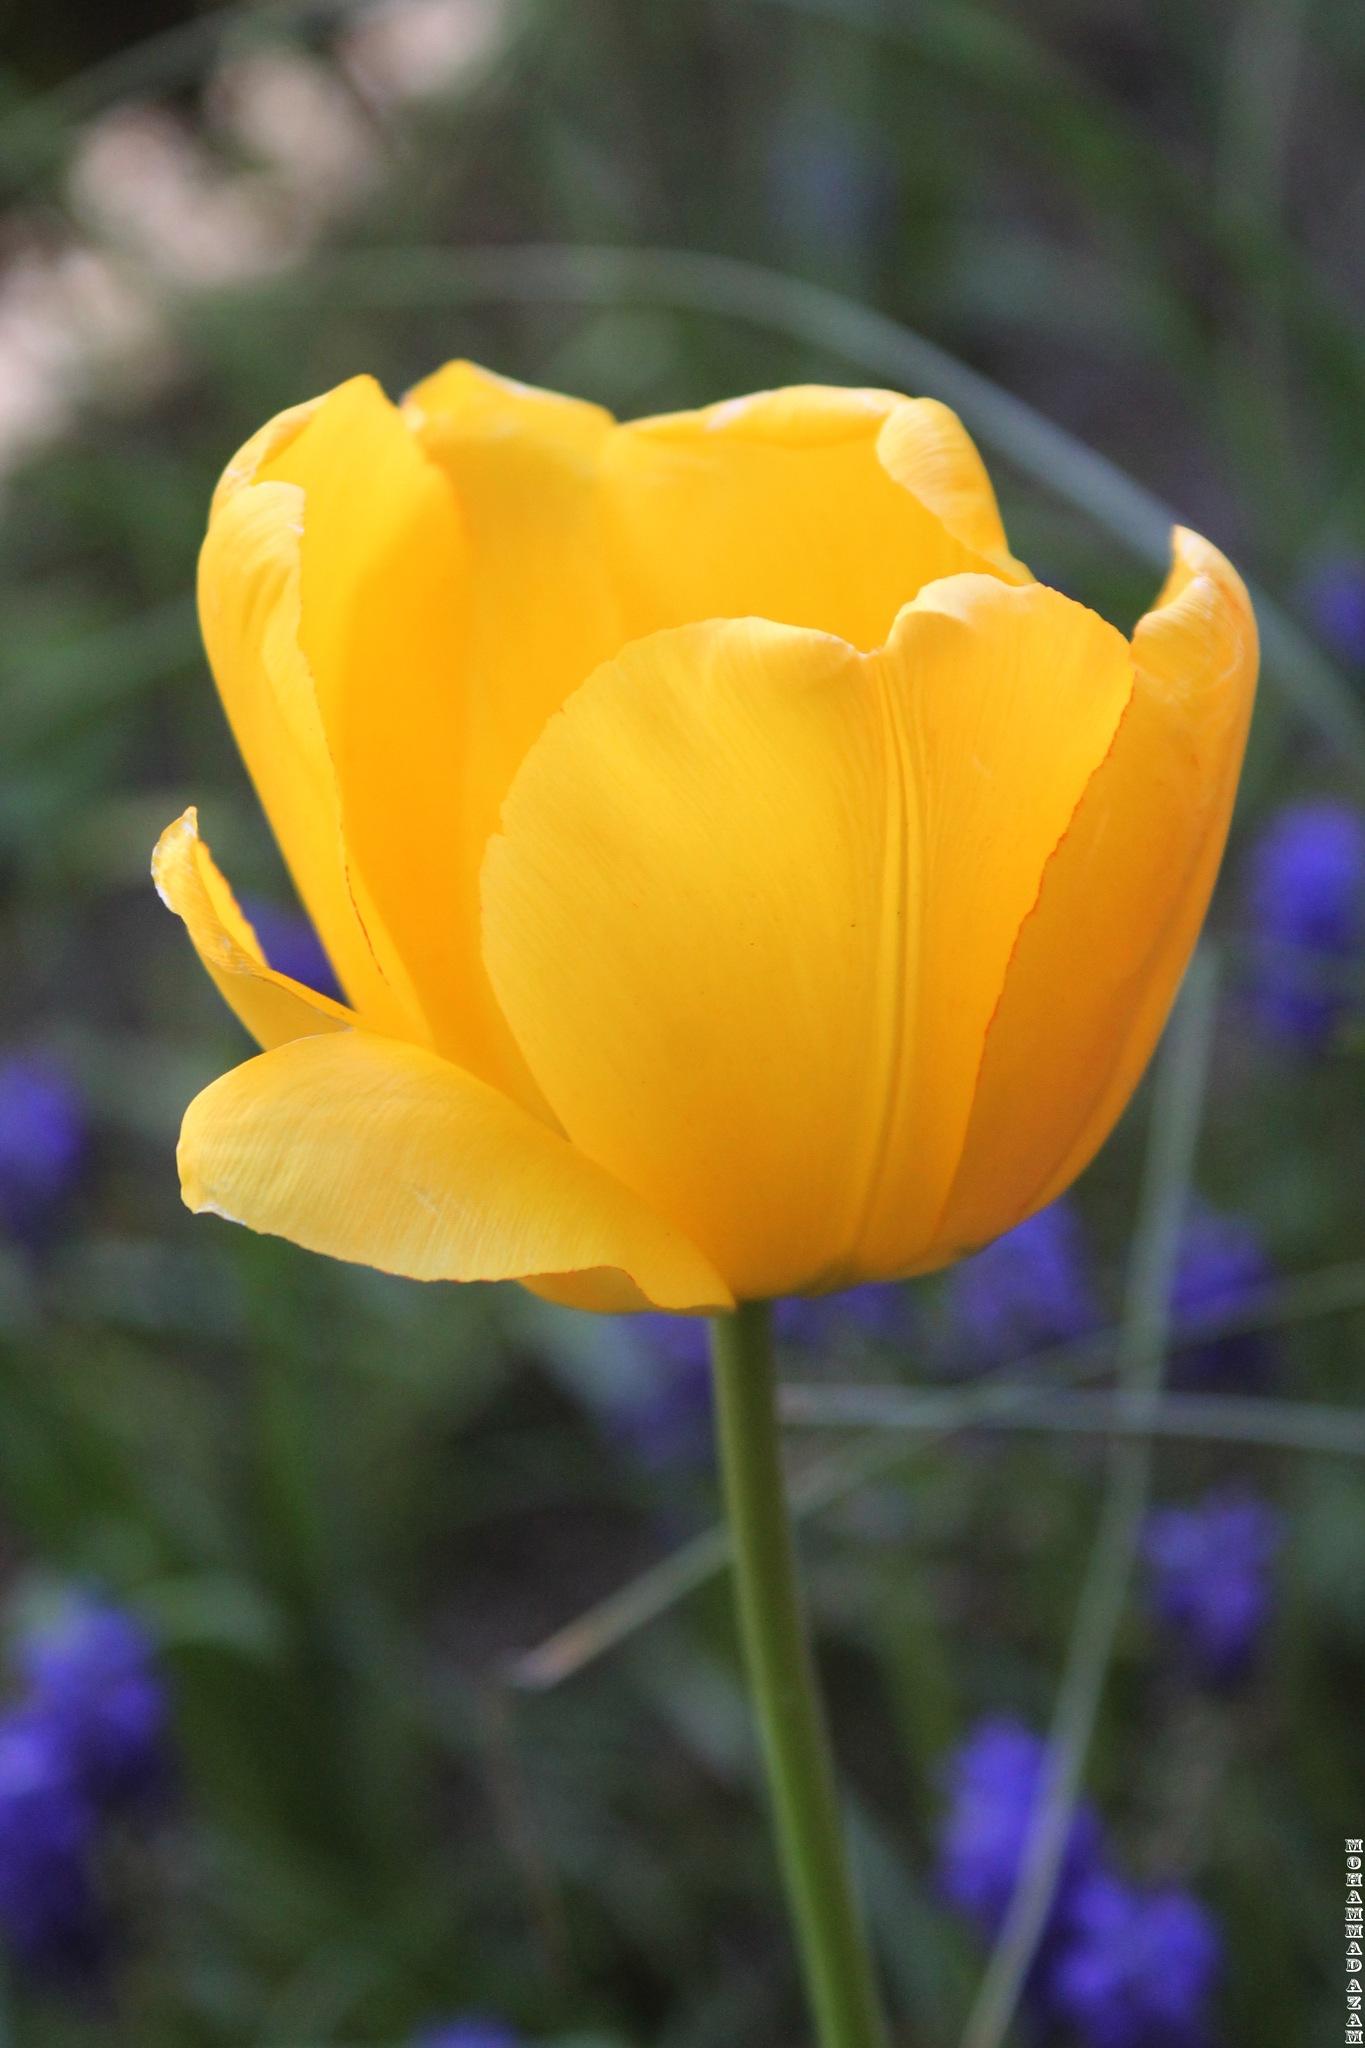 Flower 279 by Mohammad Azam